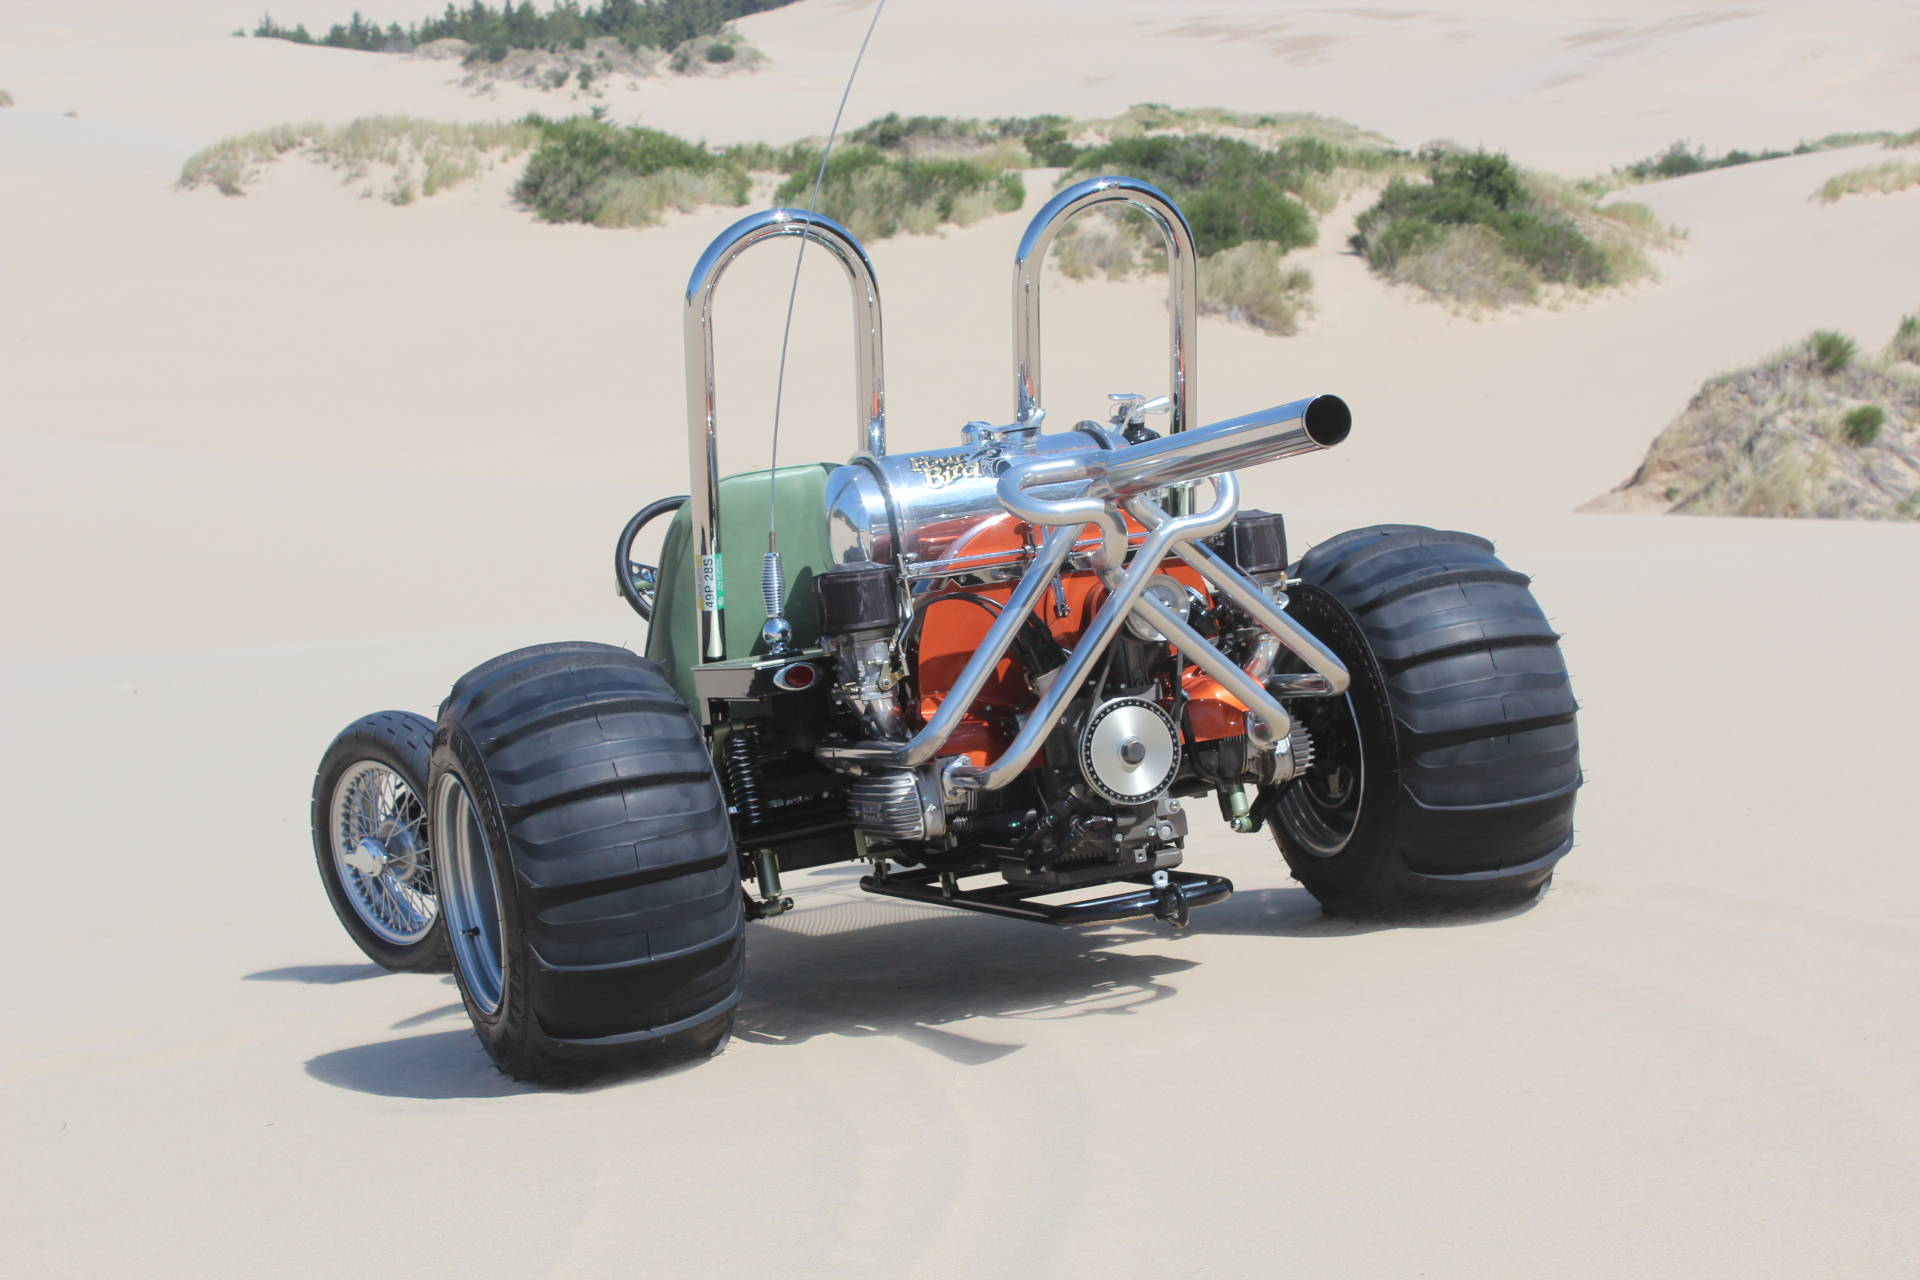 Vw Sand Rail Parts : Sand rail dune buggy frames car interior design